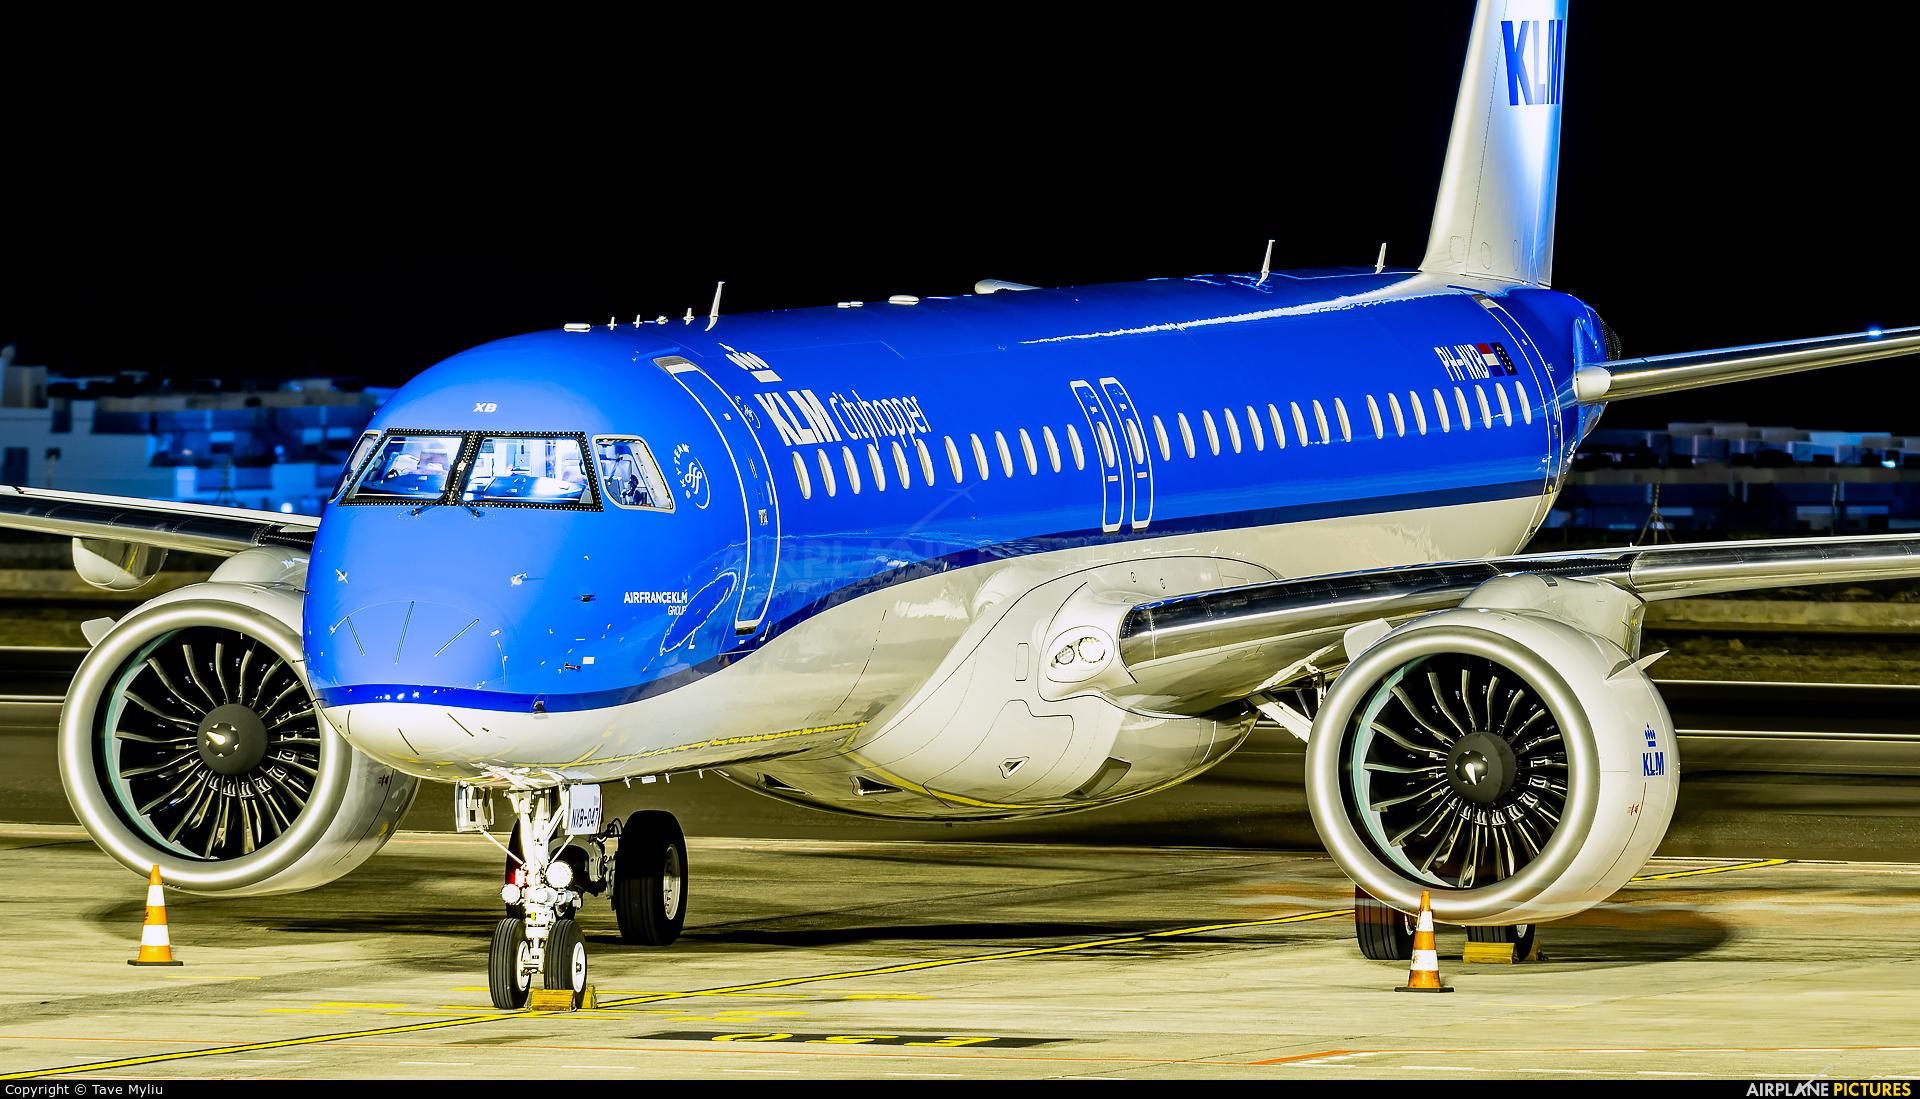 KLM Cityhopper PH-NXB aircraft at Tenerife Sur - Reina Sofia